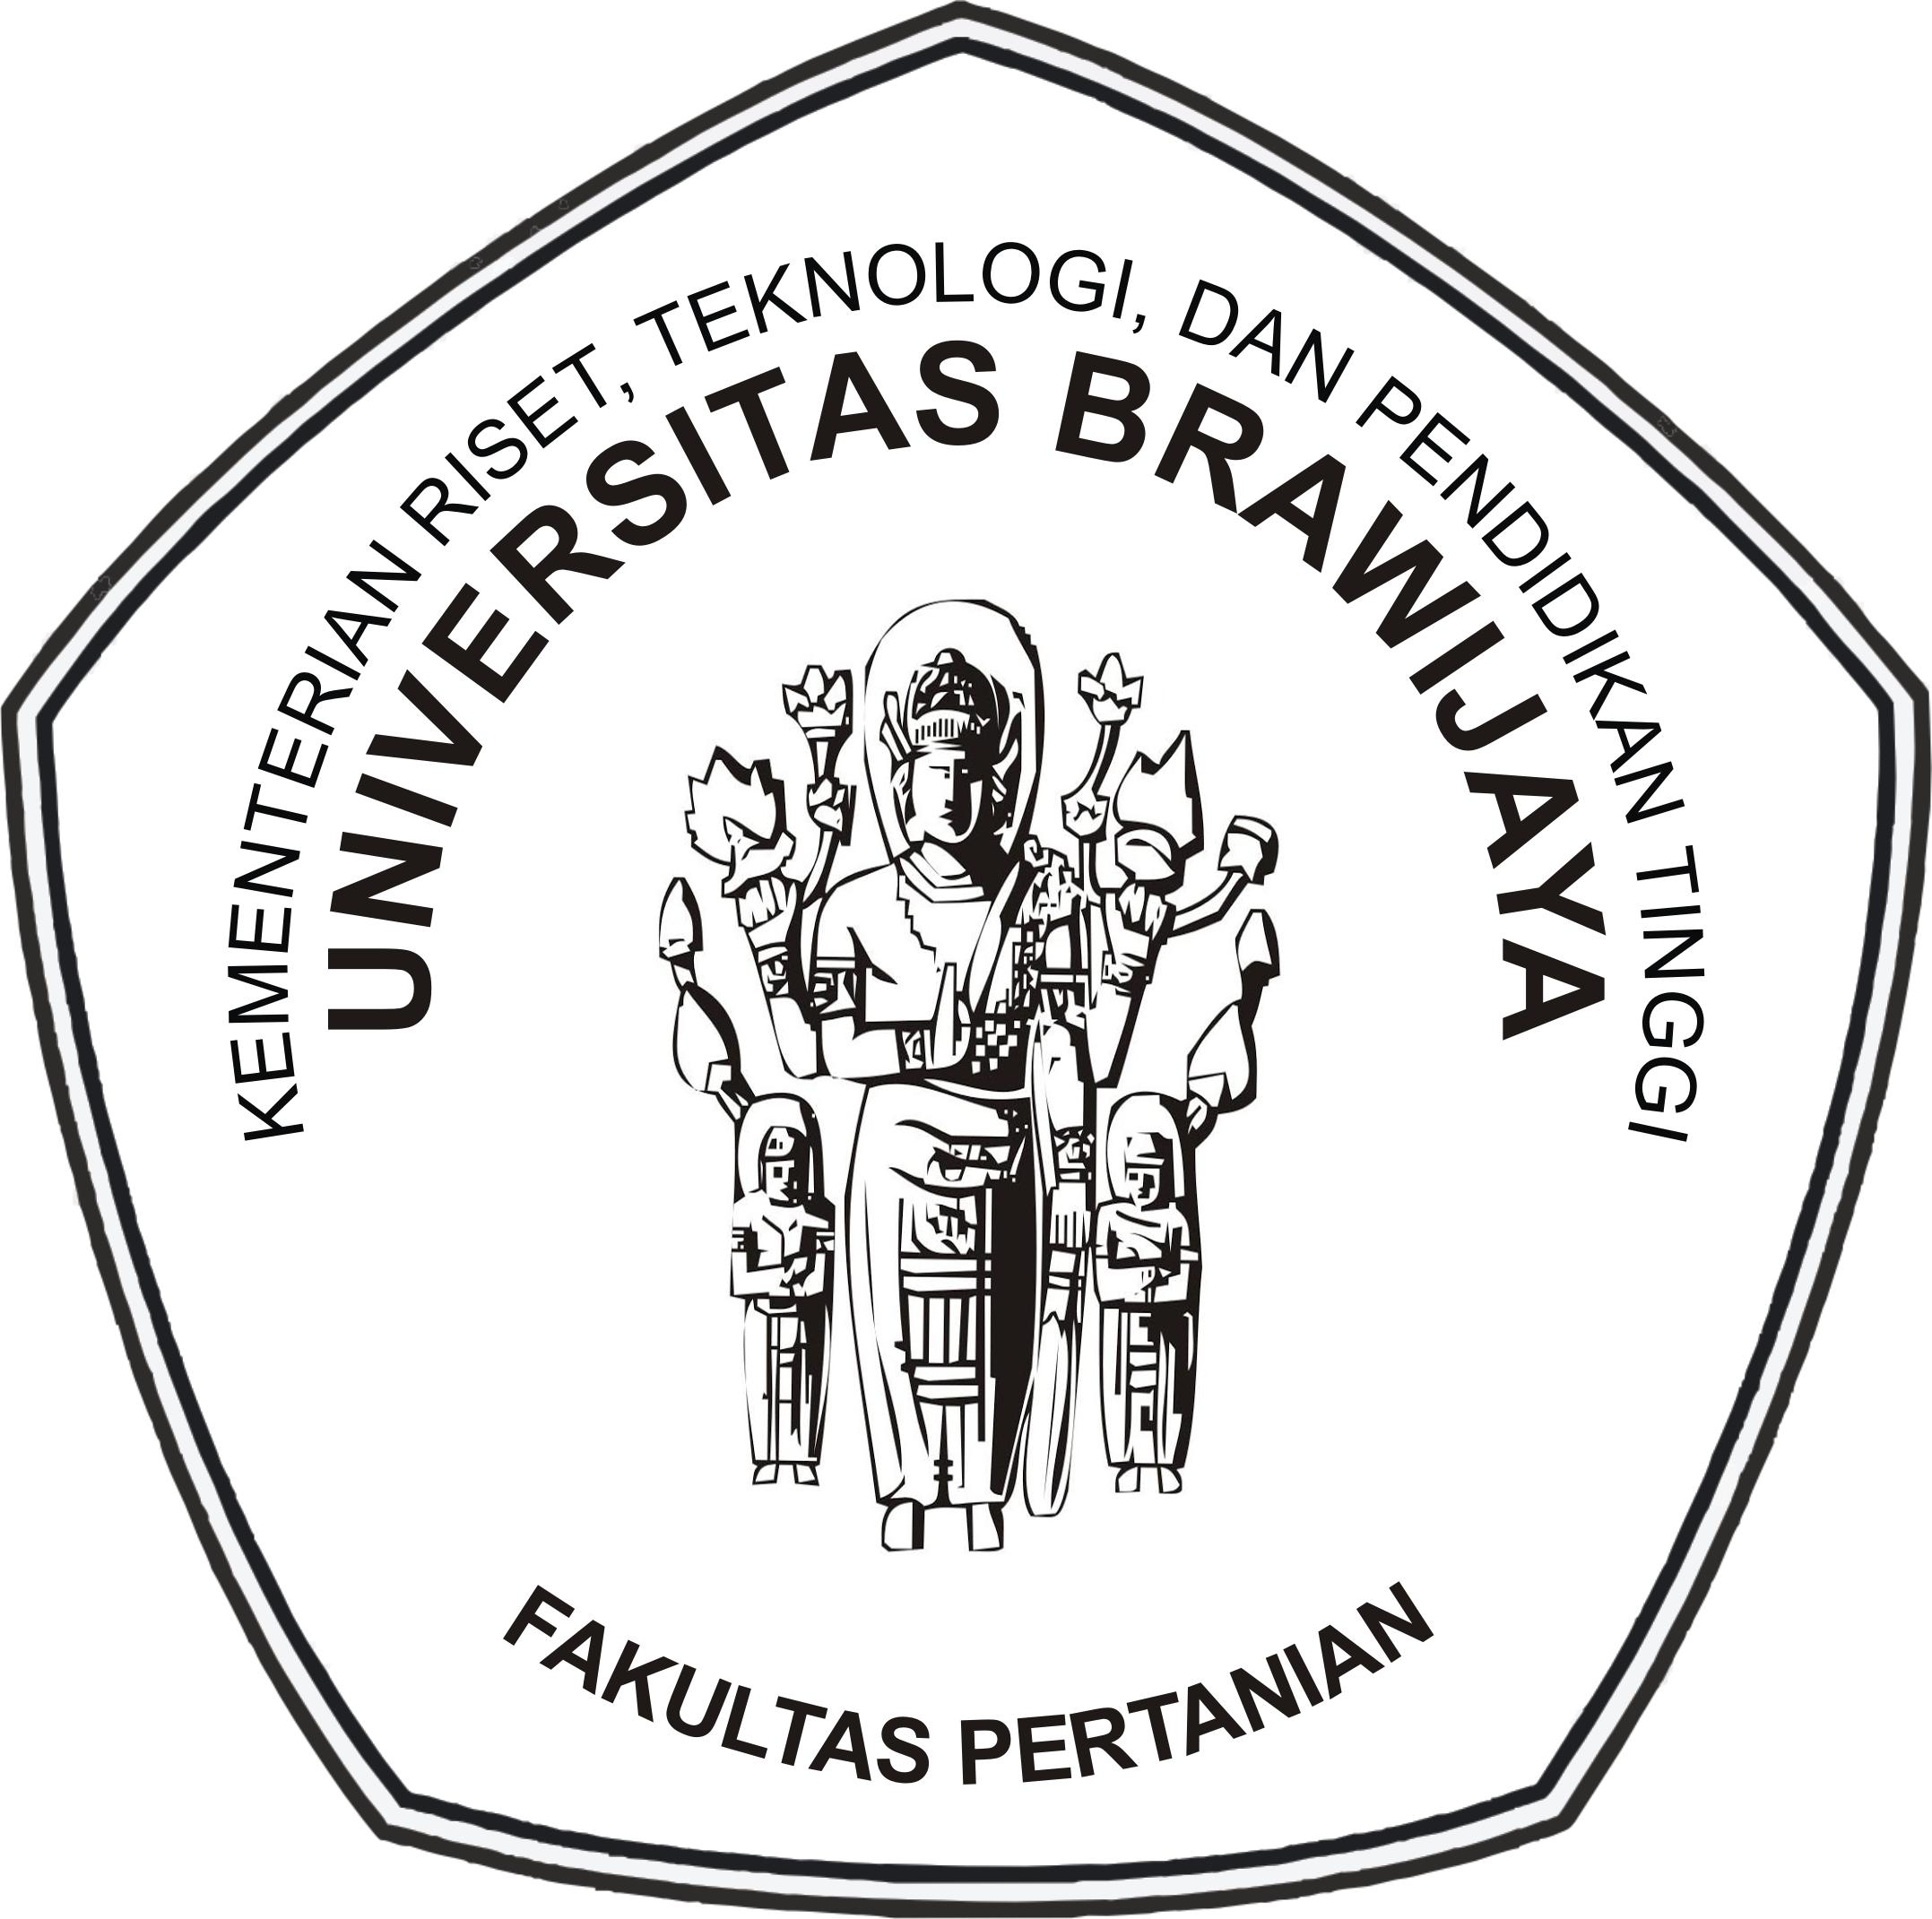 logo fakultas pertanian kemenristek dikti fakultas pertanian logo fakultas pertanian kemenristek